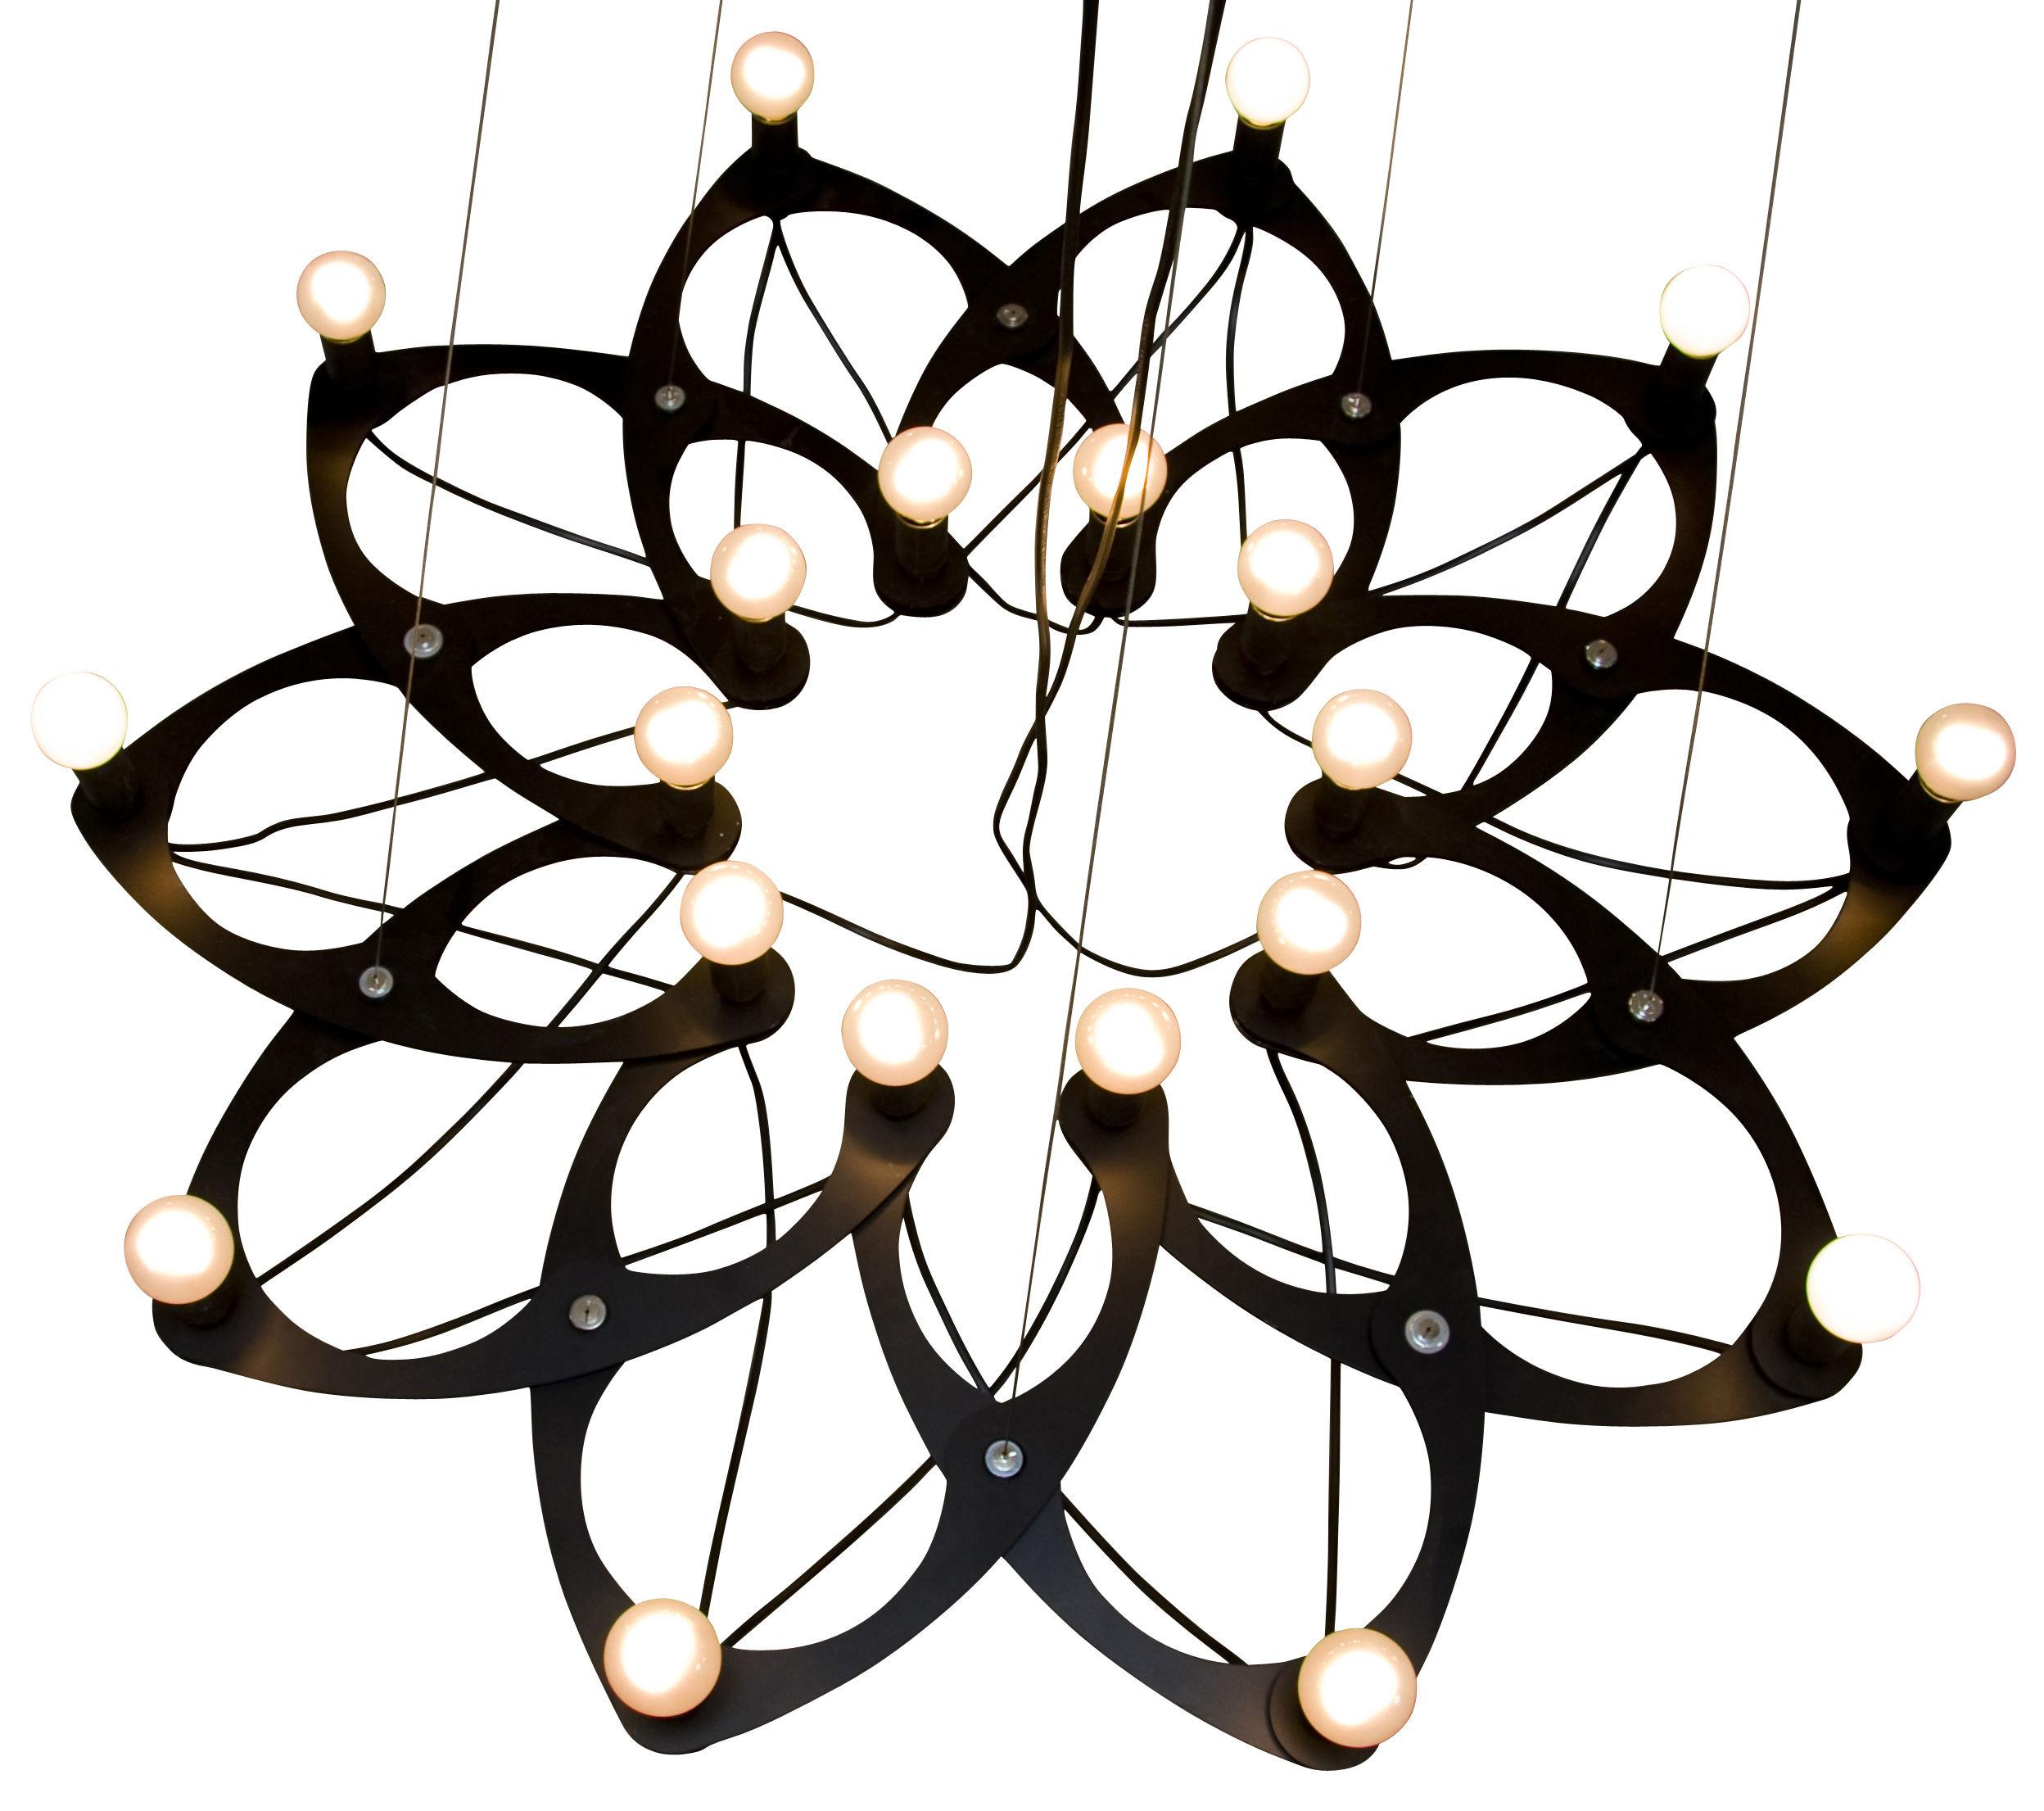 Leuchten - Pendelleuchten - Ornametrica Pendelleuchte Modular - Bloom! - Schwarz - lackiertes Aluminium